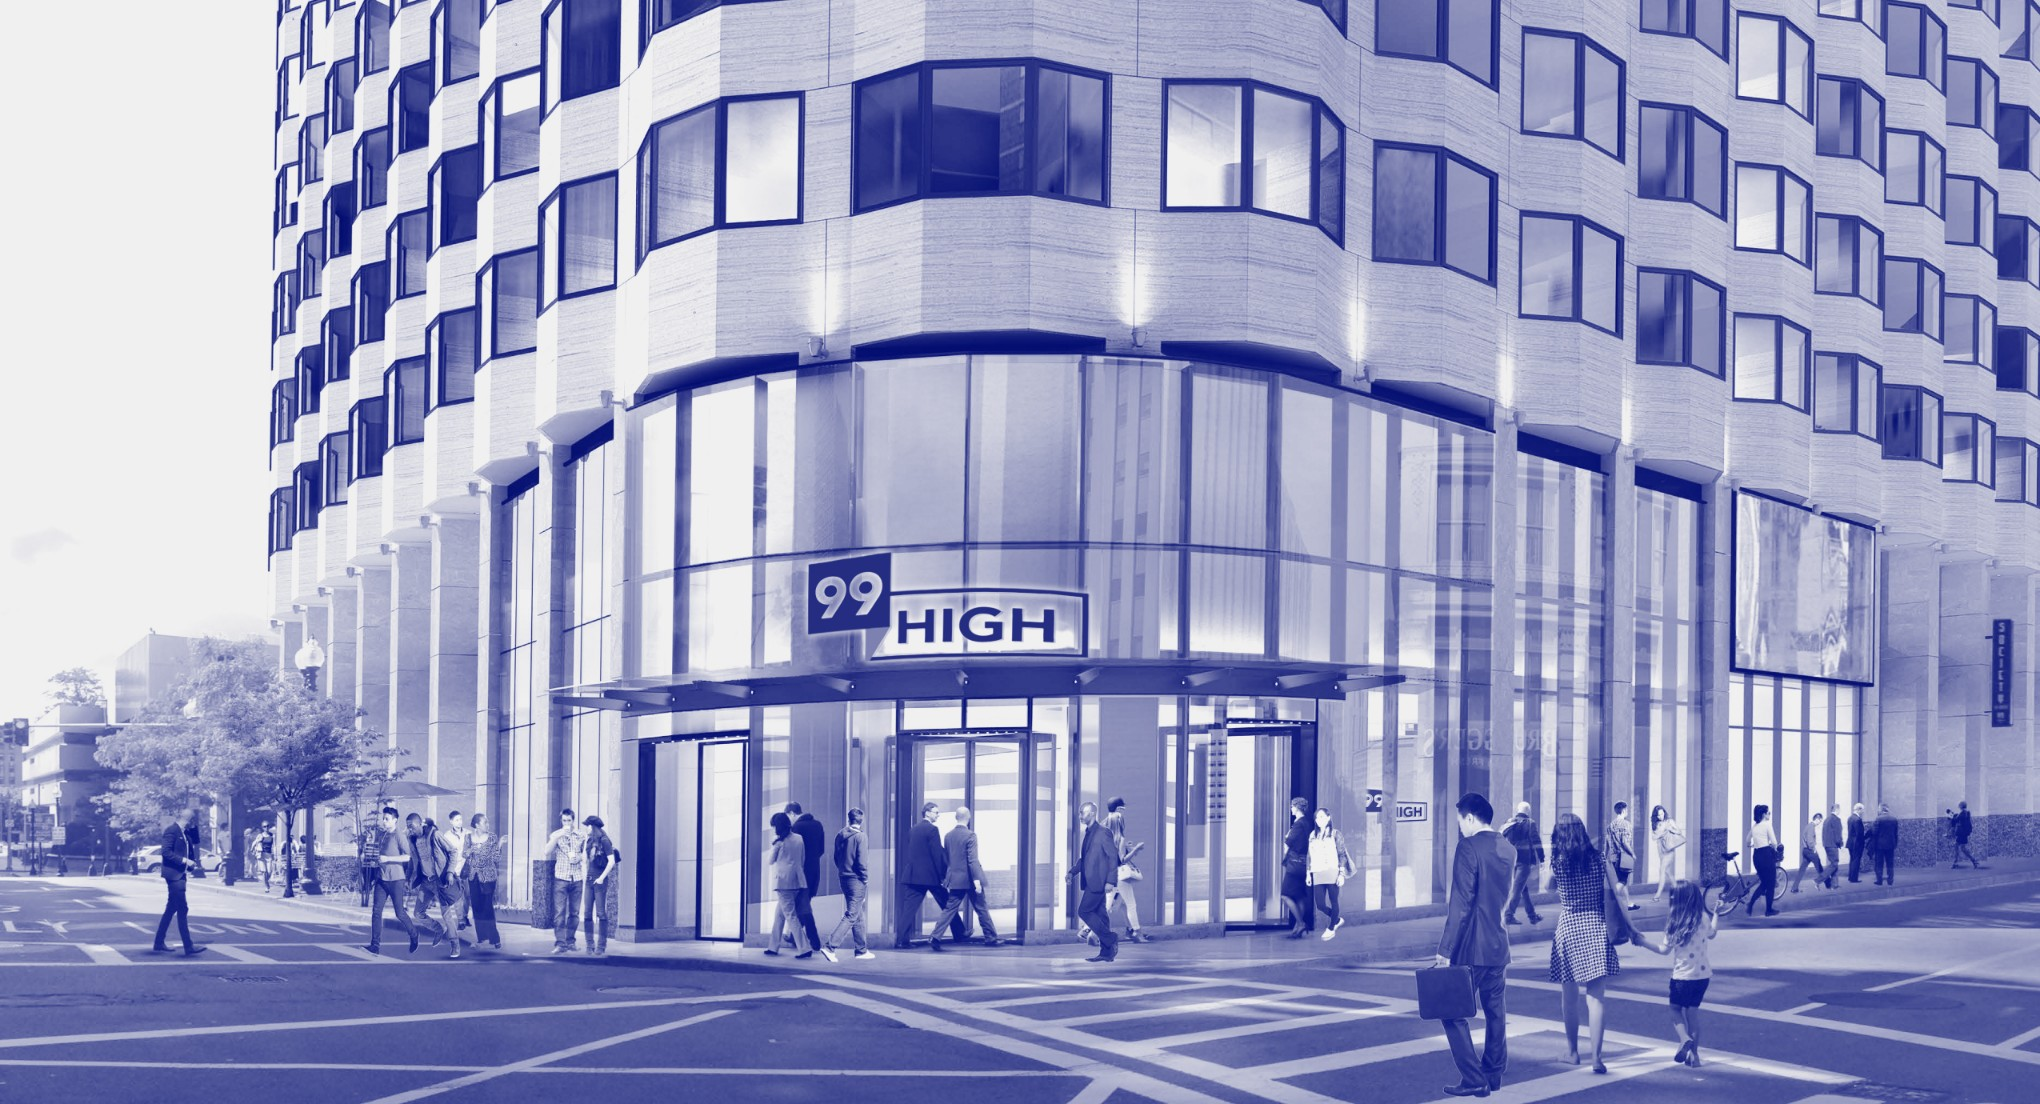 99 High Street Boston MA